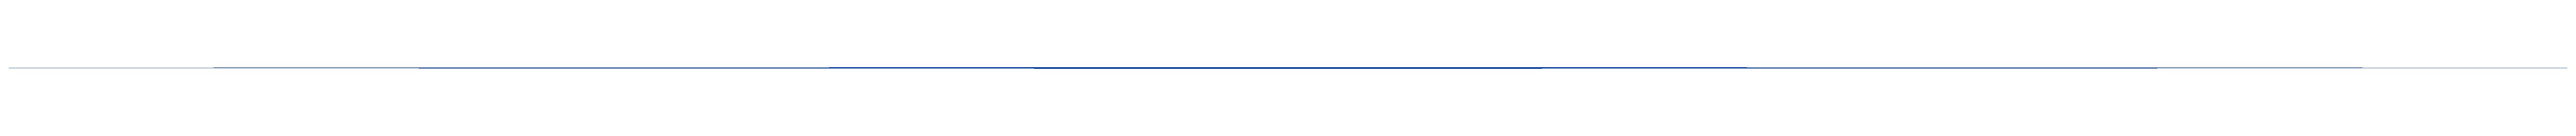 blue-line-01